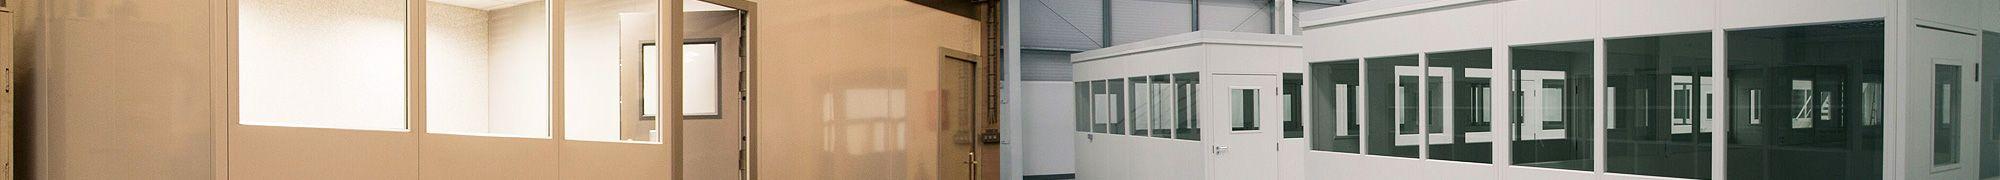 Mezzanines and mezzanine flooring fitted